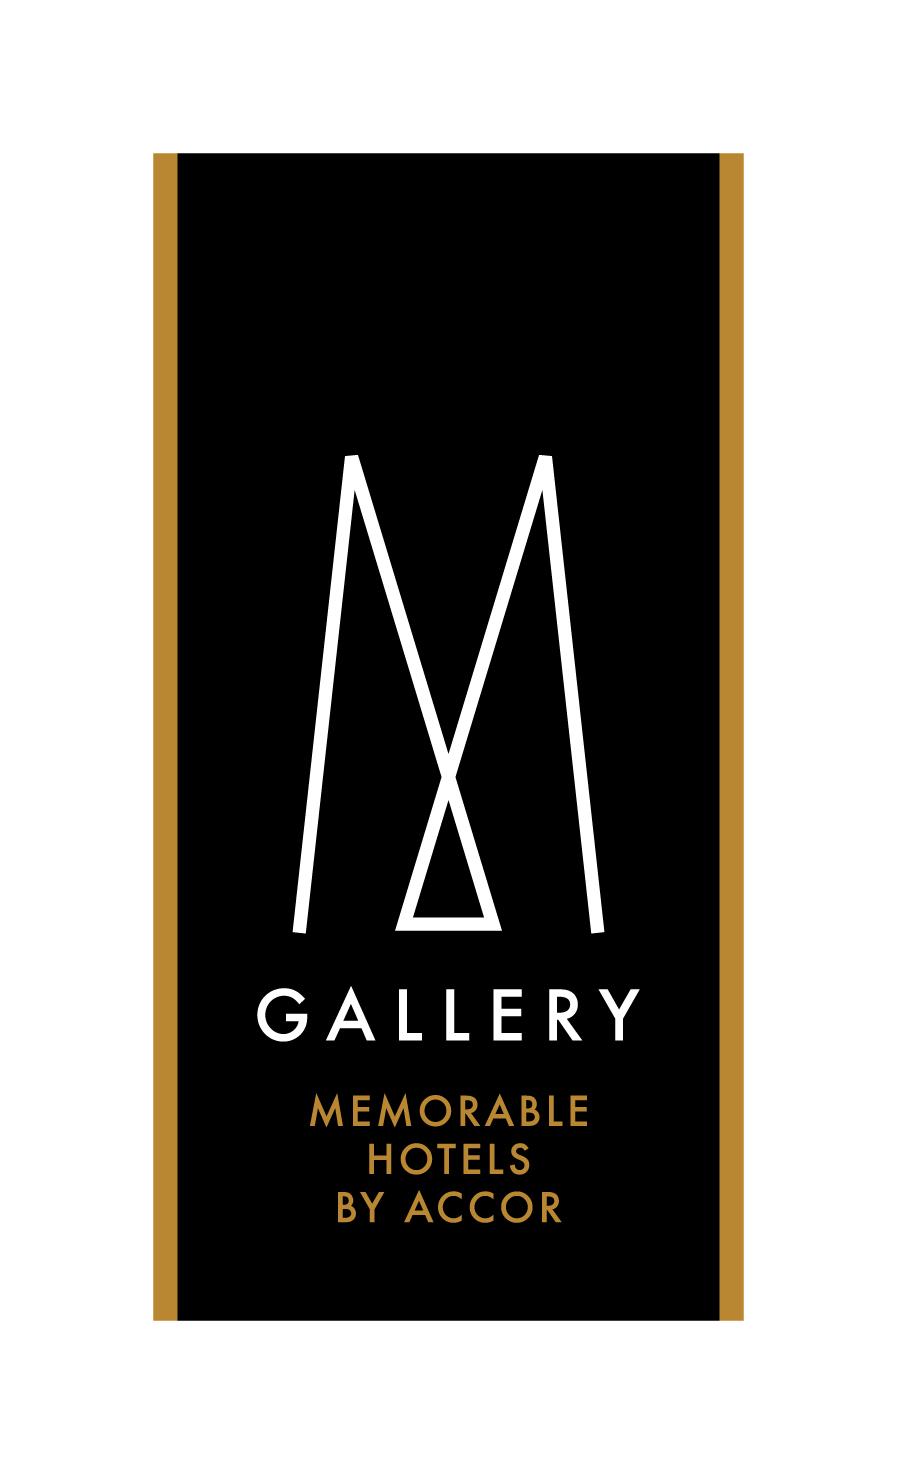 mgallery_memorable_hotels Logo